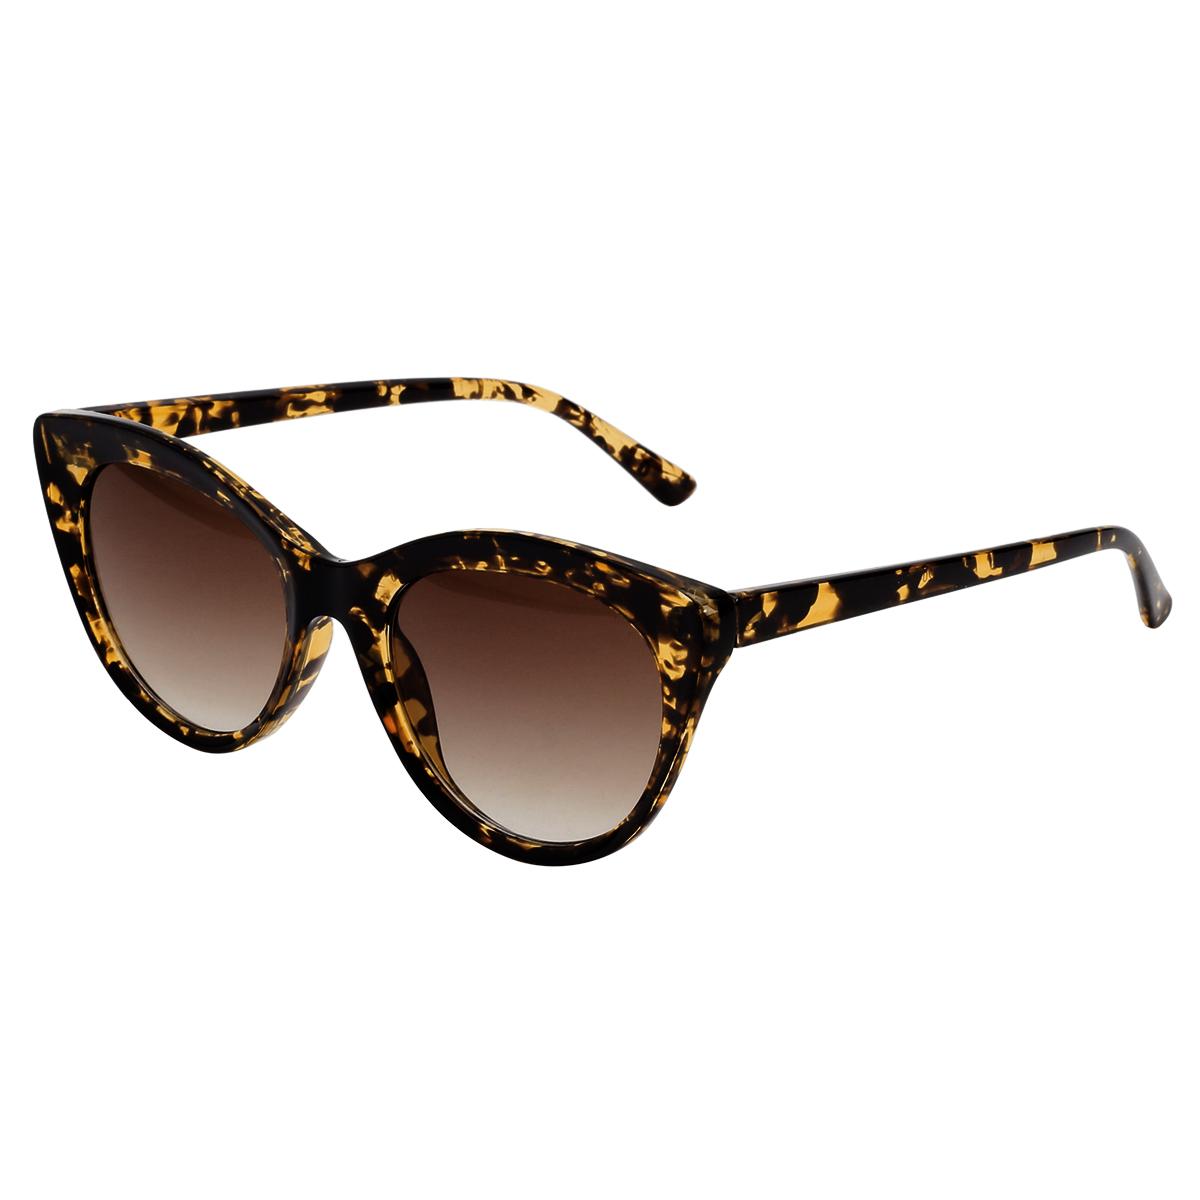 Zonnebril Summertime bruin bruine kat vorm zonnebrillen trendy sunglases kopen bestellen fashion